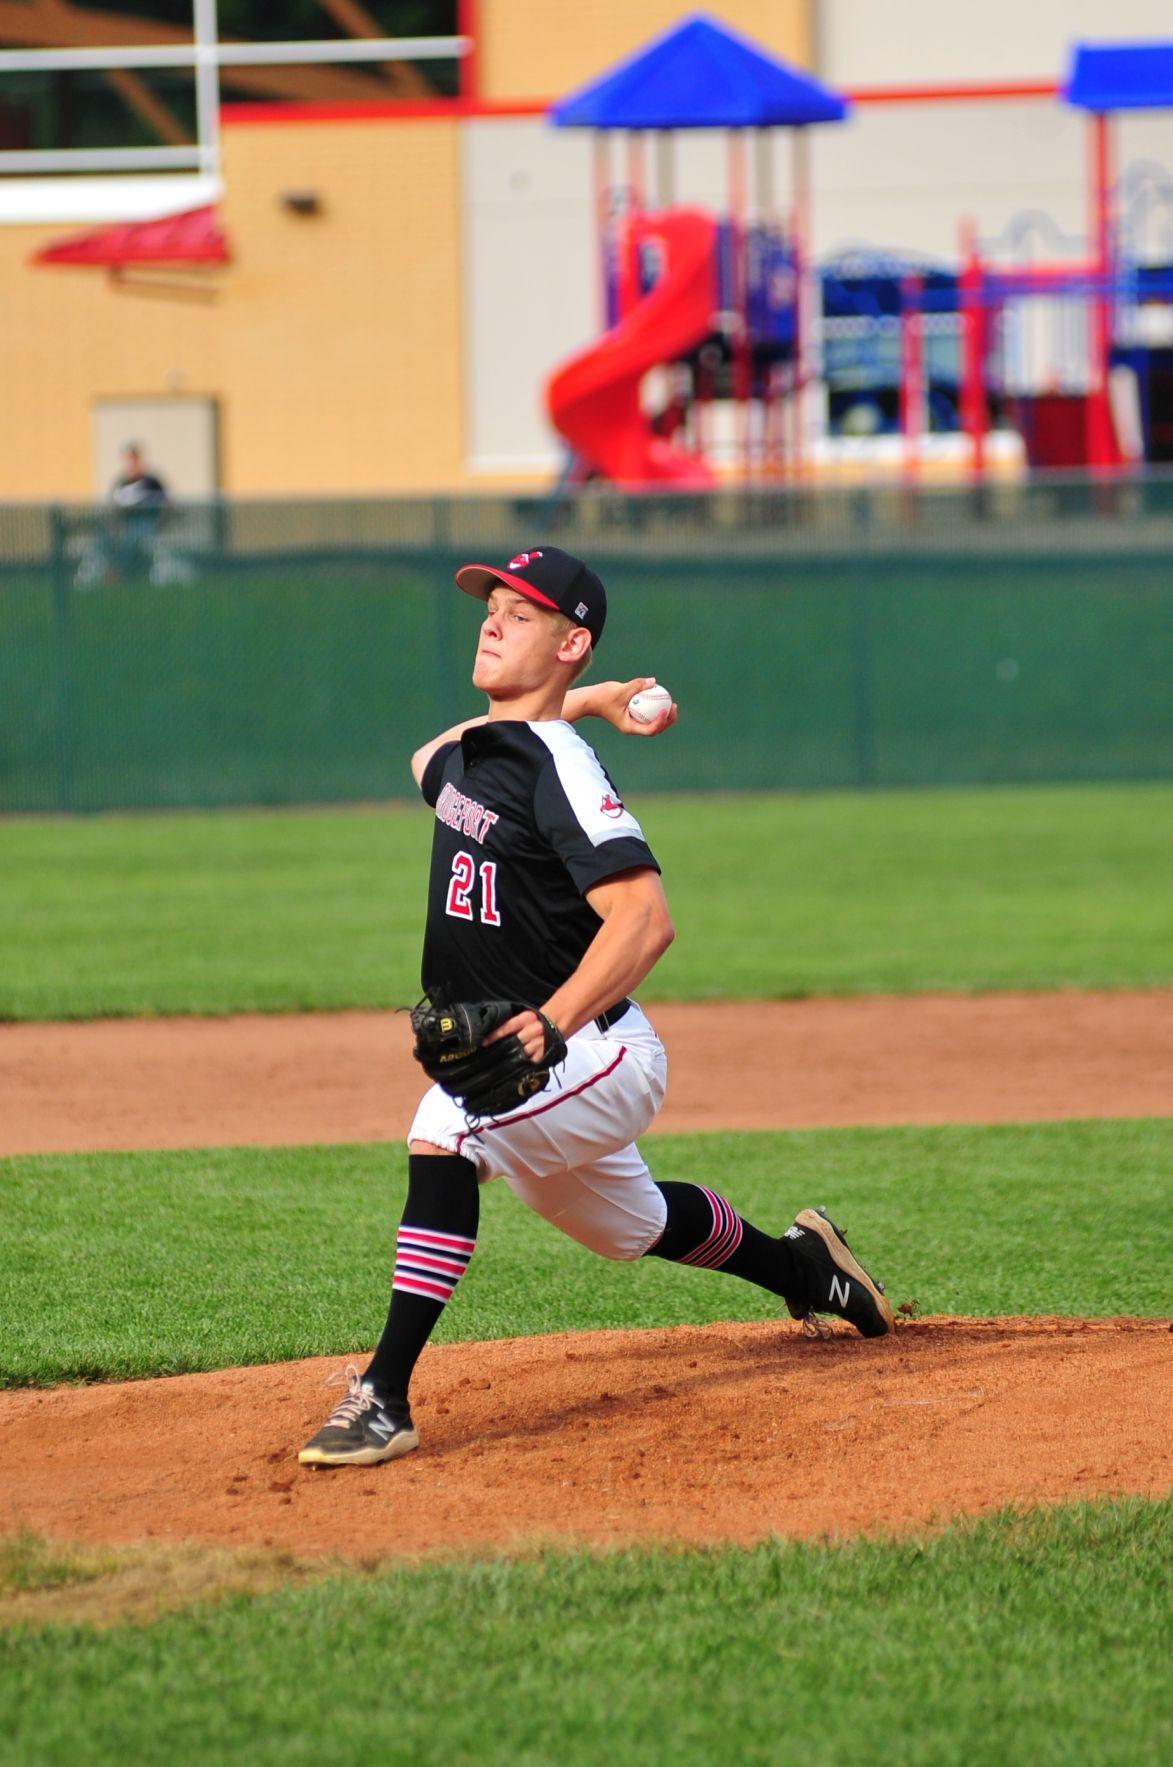 bport pitcher 21.JPG